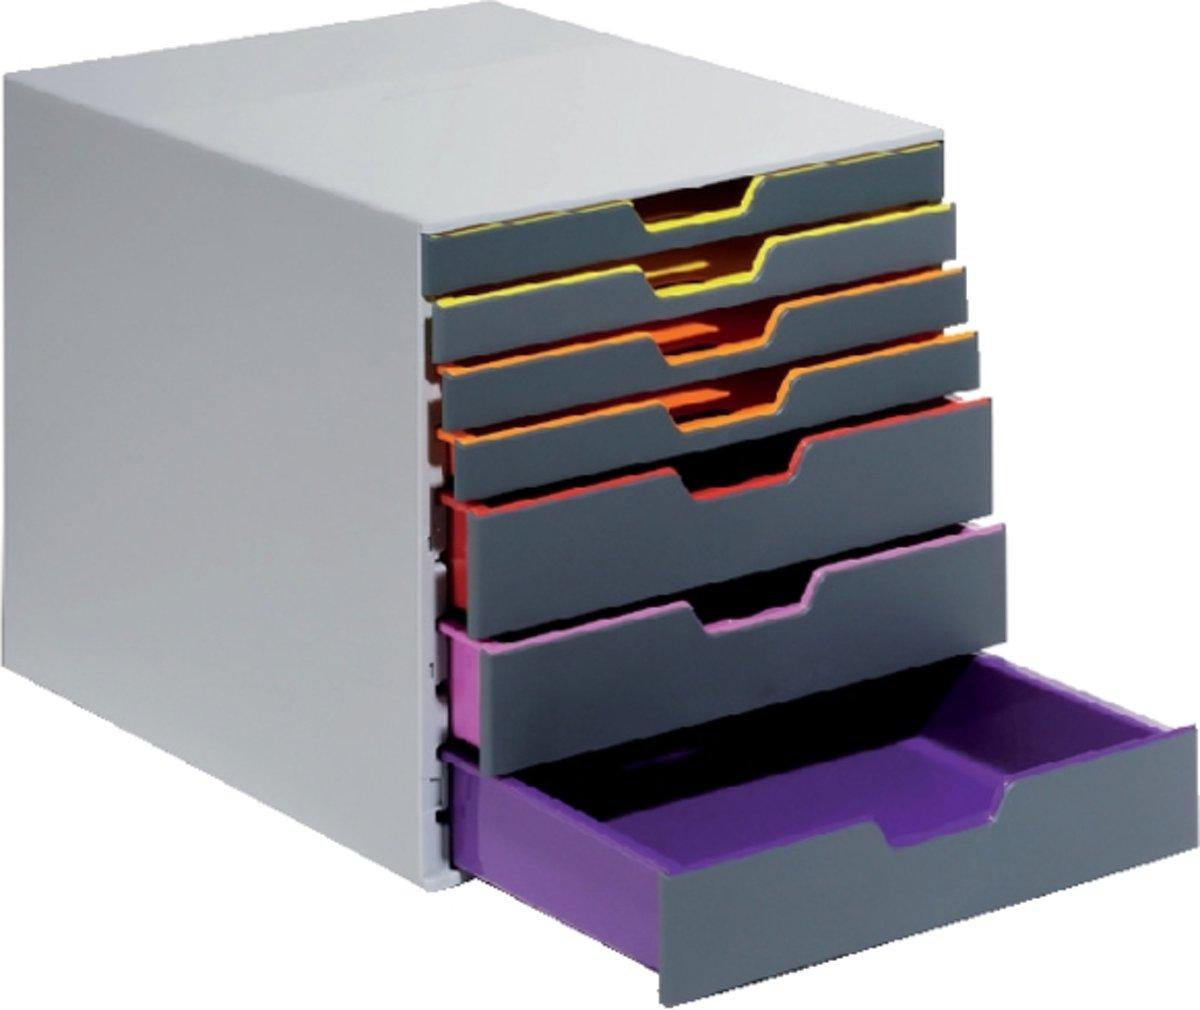 Durable Ladebox VARICOLOR 7 - 7607 760727 Grijs DIN A4, DIN C4, Folio, Letter Aantal lades: 7